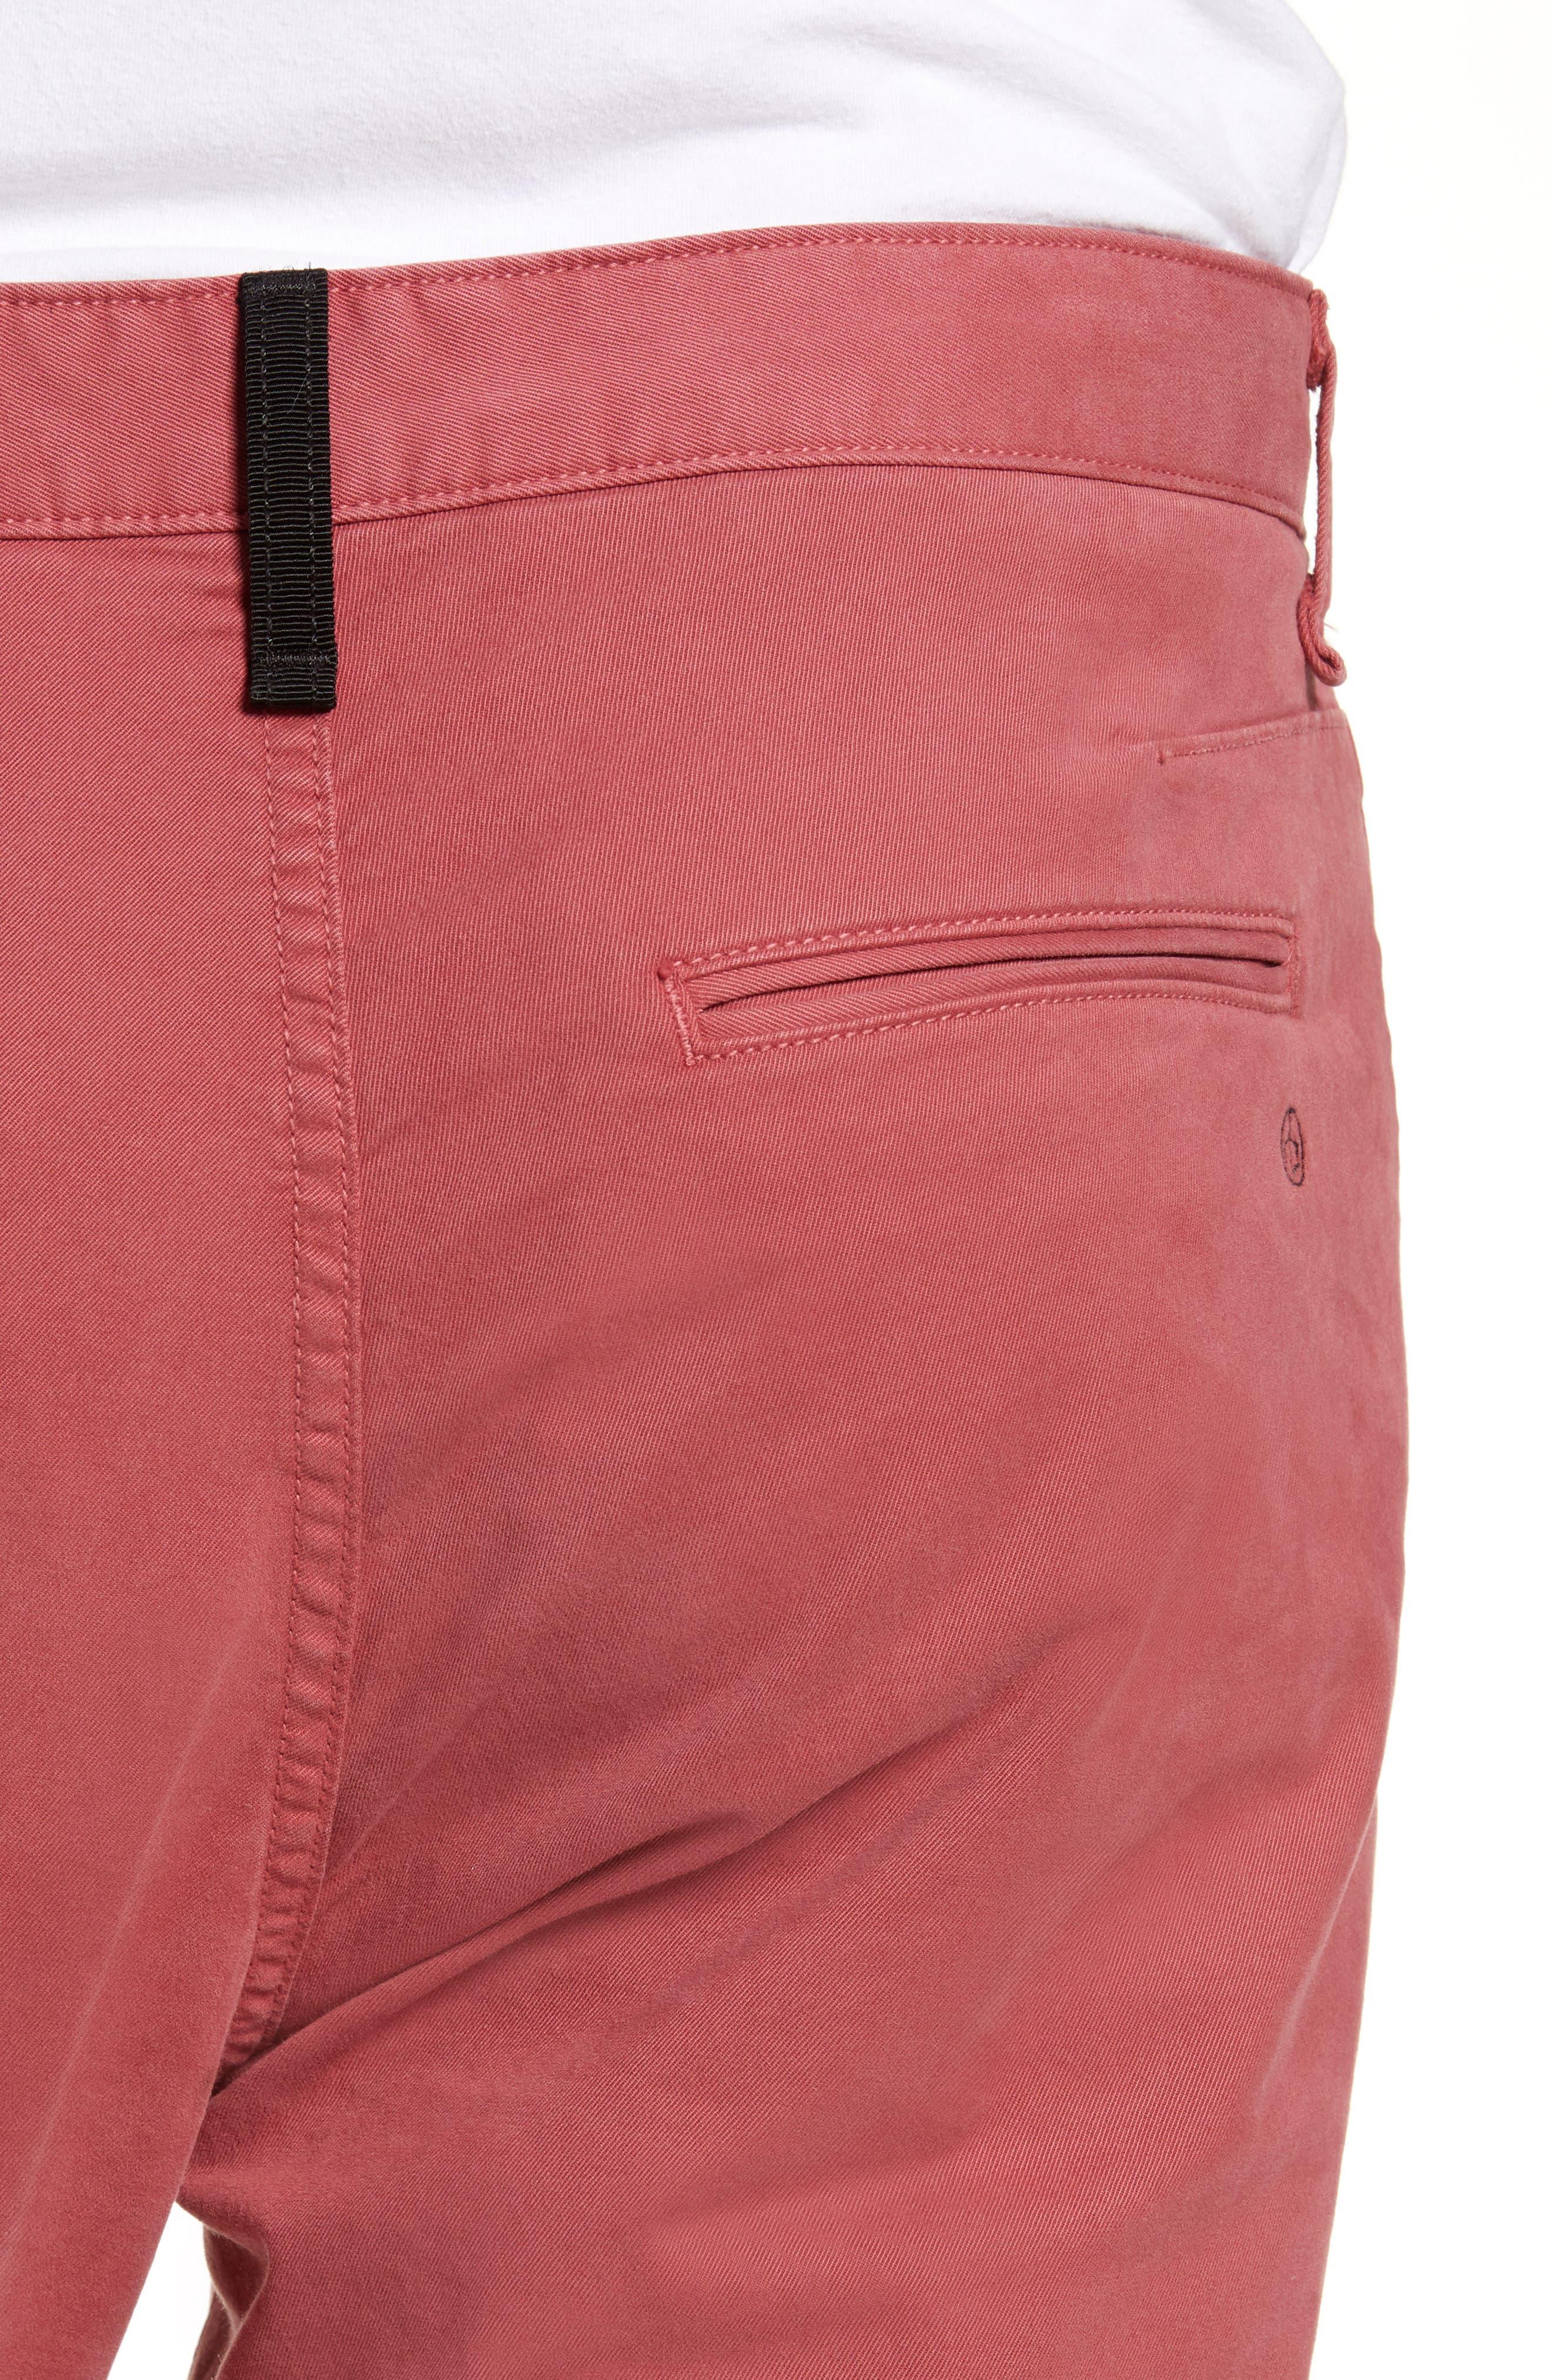 RAG & BONE,                             Fit 2 Slim Fit Chinos,                             Alternate thumbnail 4, color,                             ELLIS RED